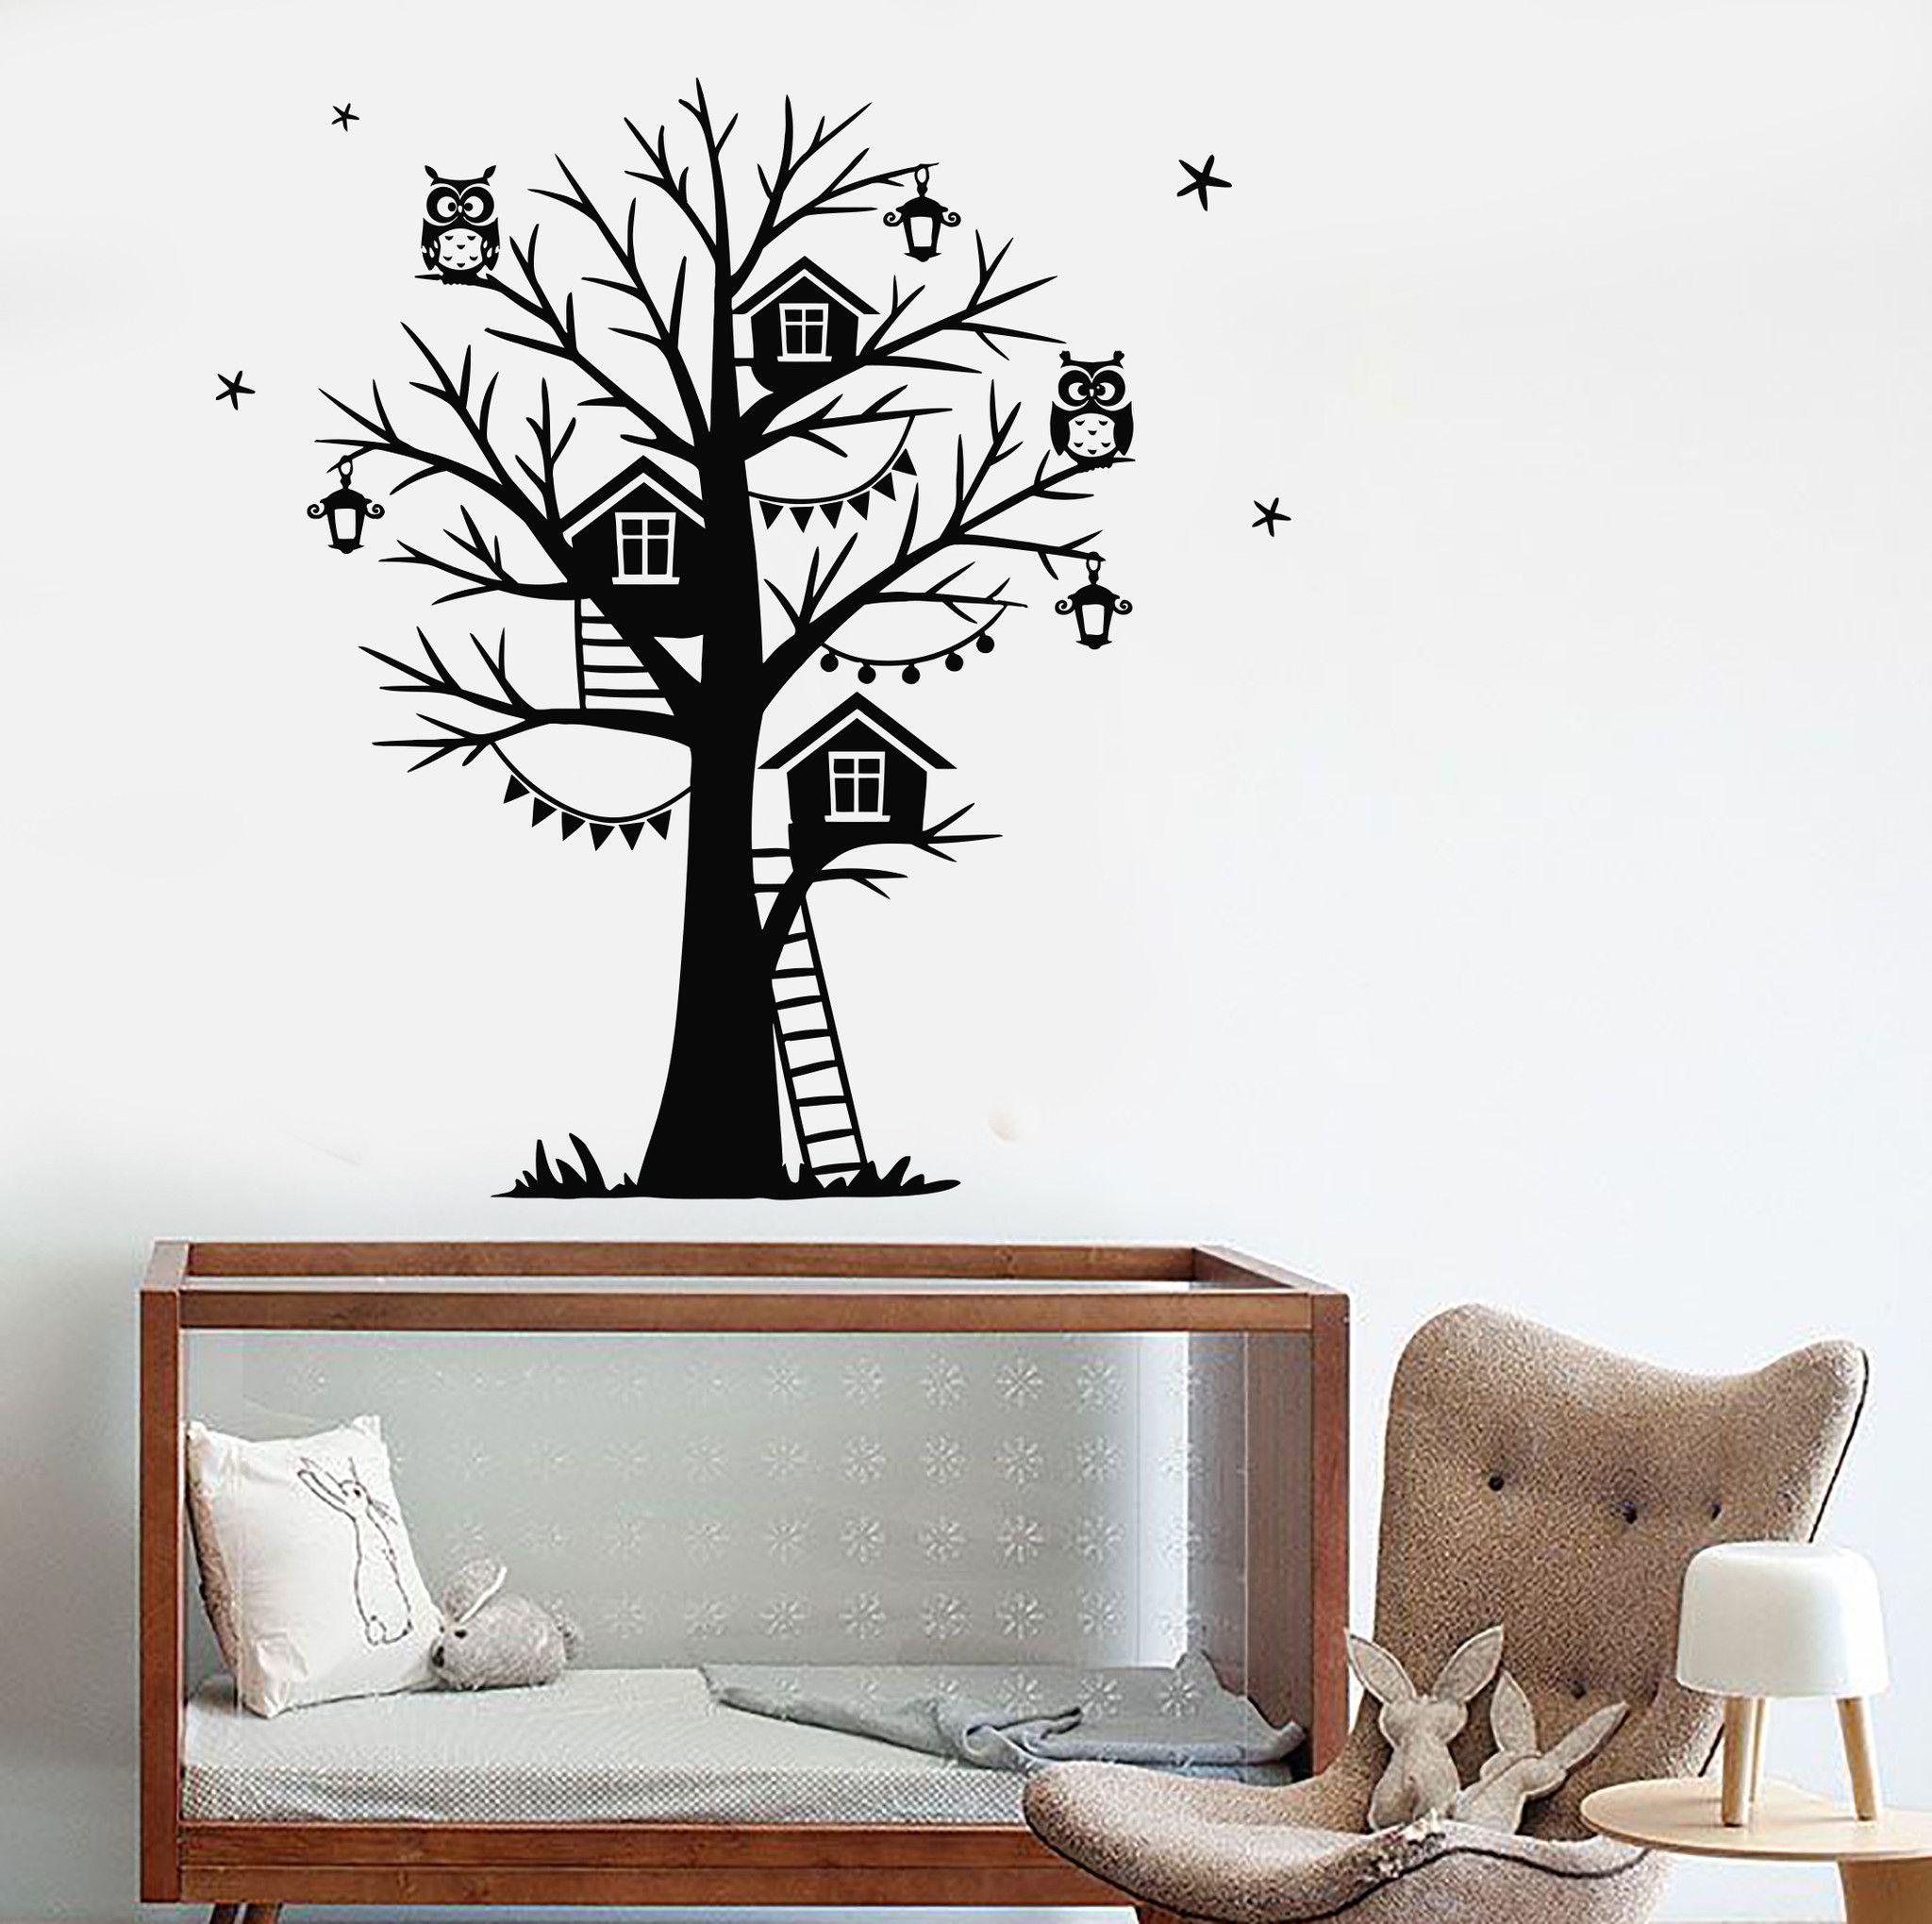 Vinyl Wall Decal Owls Lanterns Branches Tree House Night Stars Nursery Stickers (694ig)